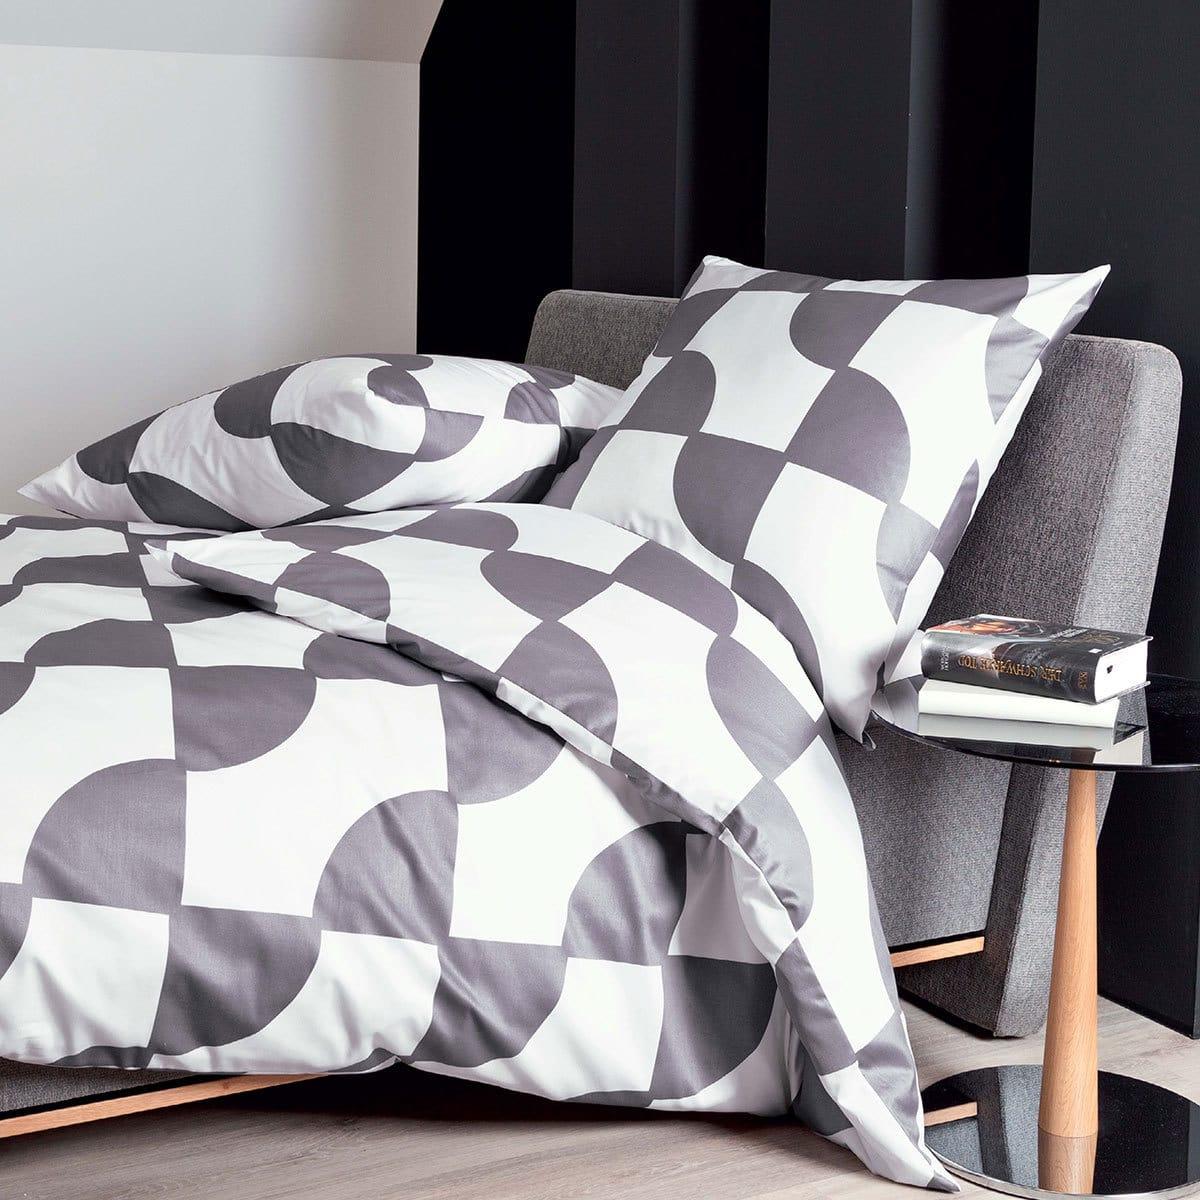 janine mako satin bettw sche j d 87019 08 platin g nstig online kaufen bei bettwaren shop. Black Bedroom Furniture Sets. Home Design Ideas